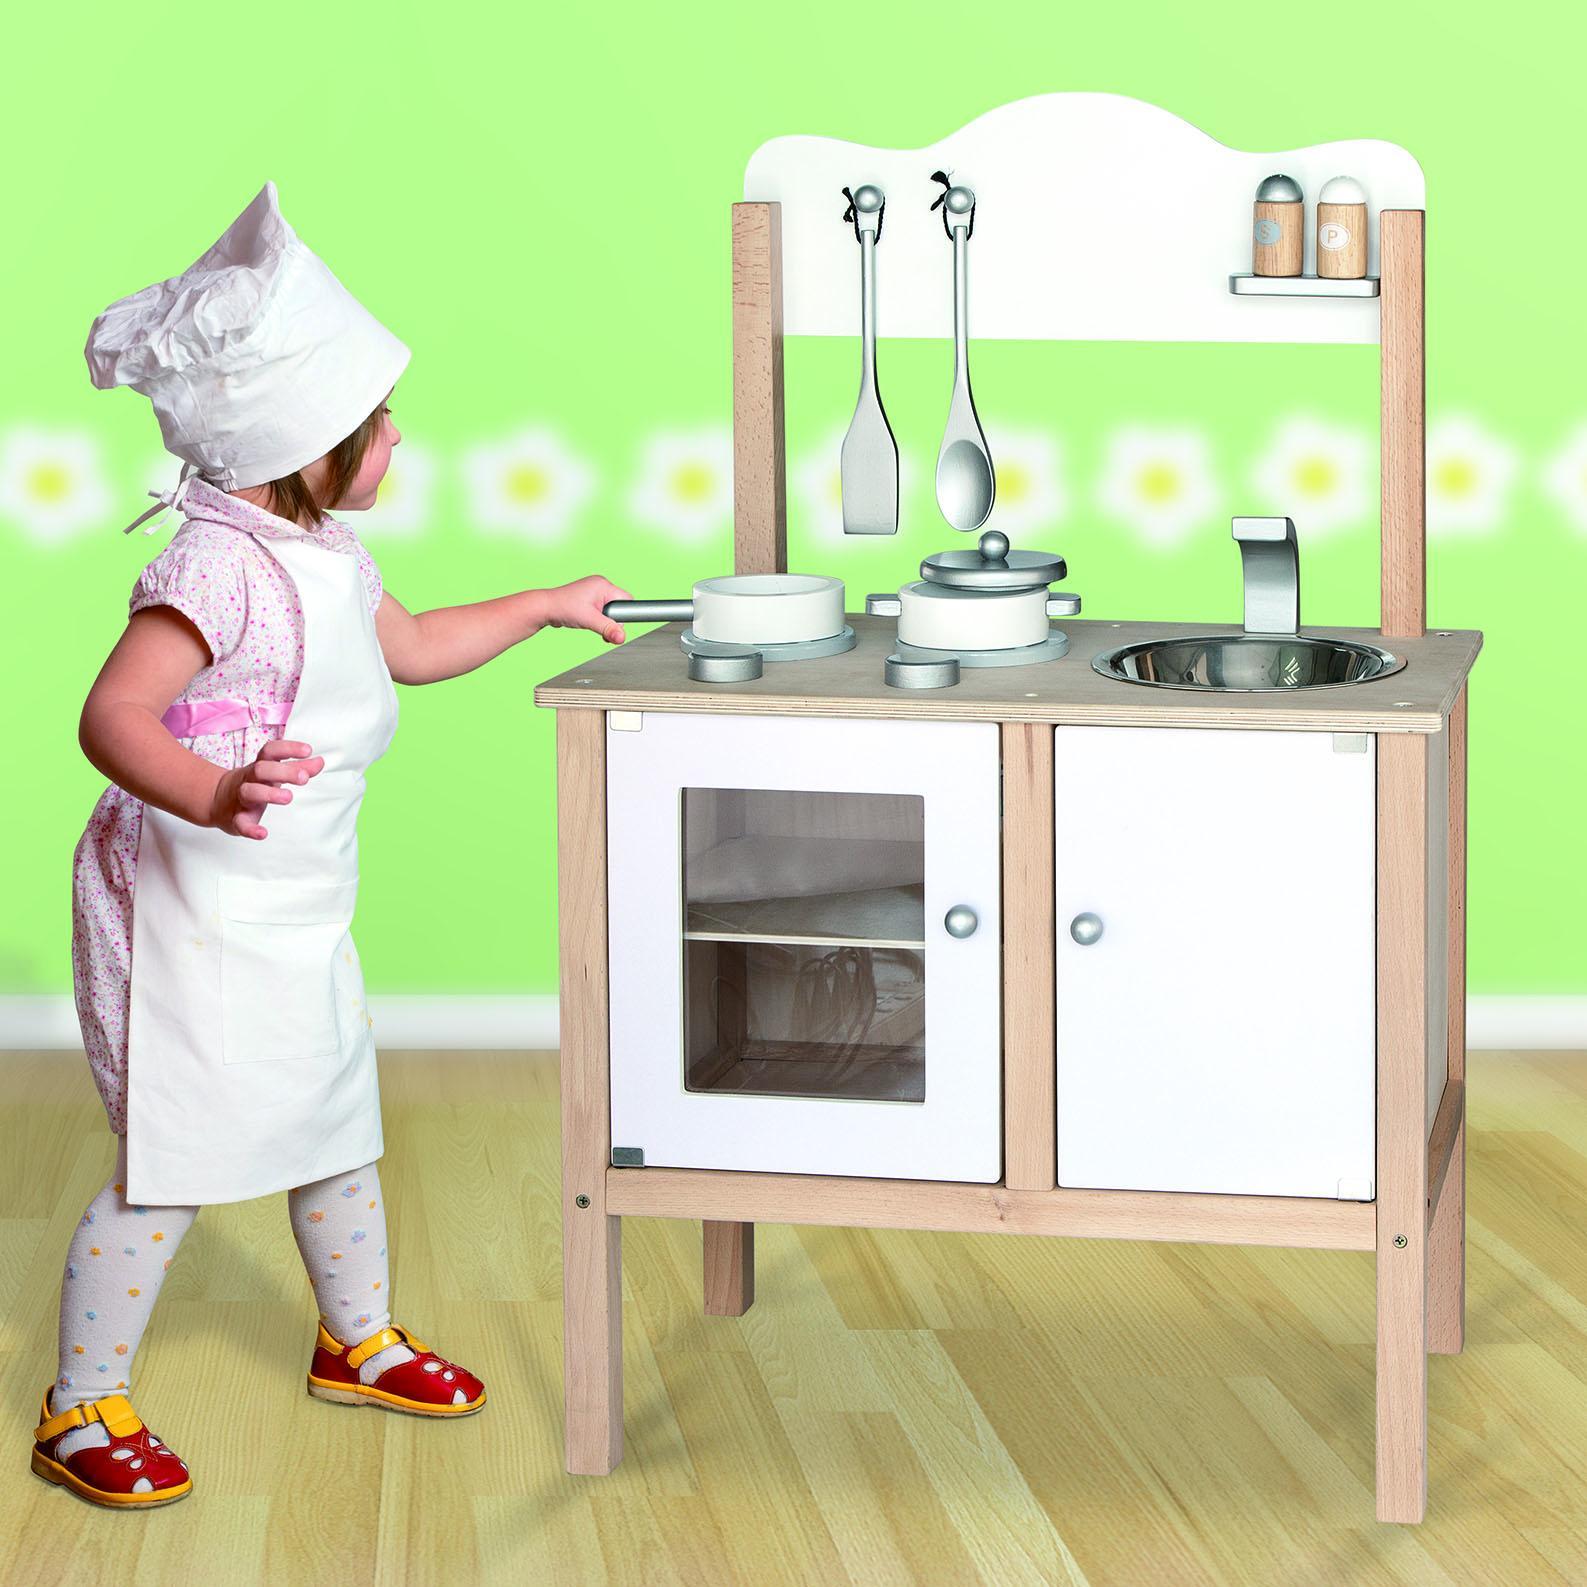 Childrens kids wooden pretend play kitchen toy play set oven sink hob